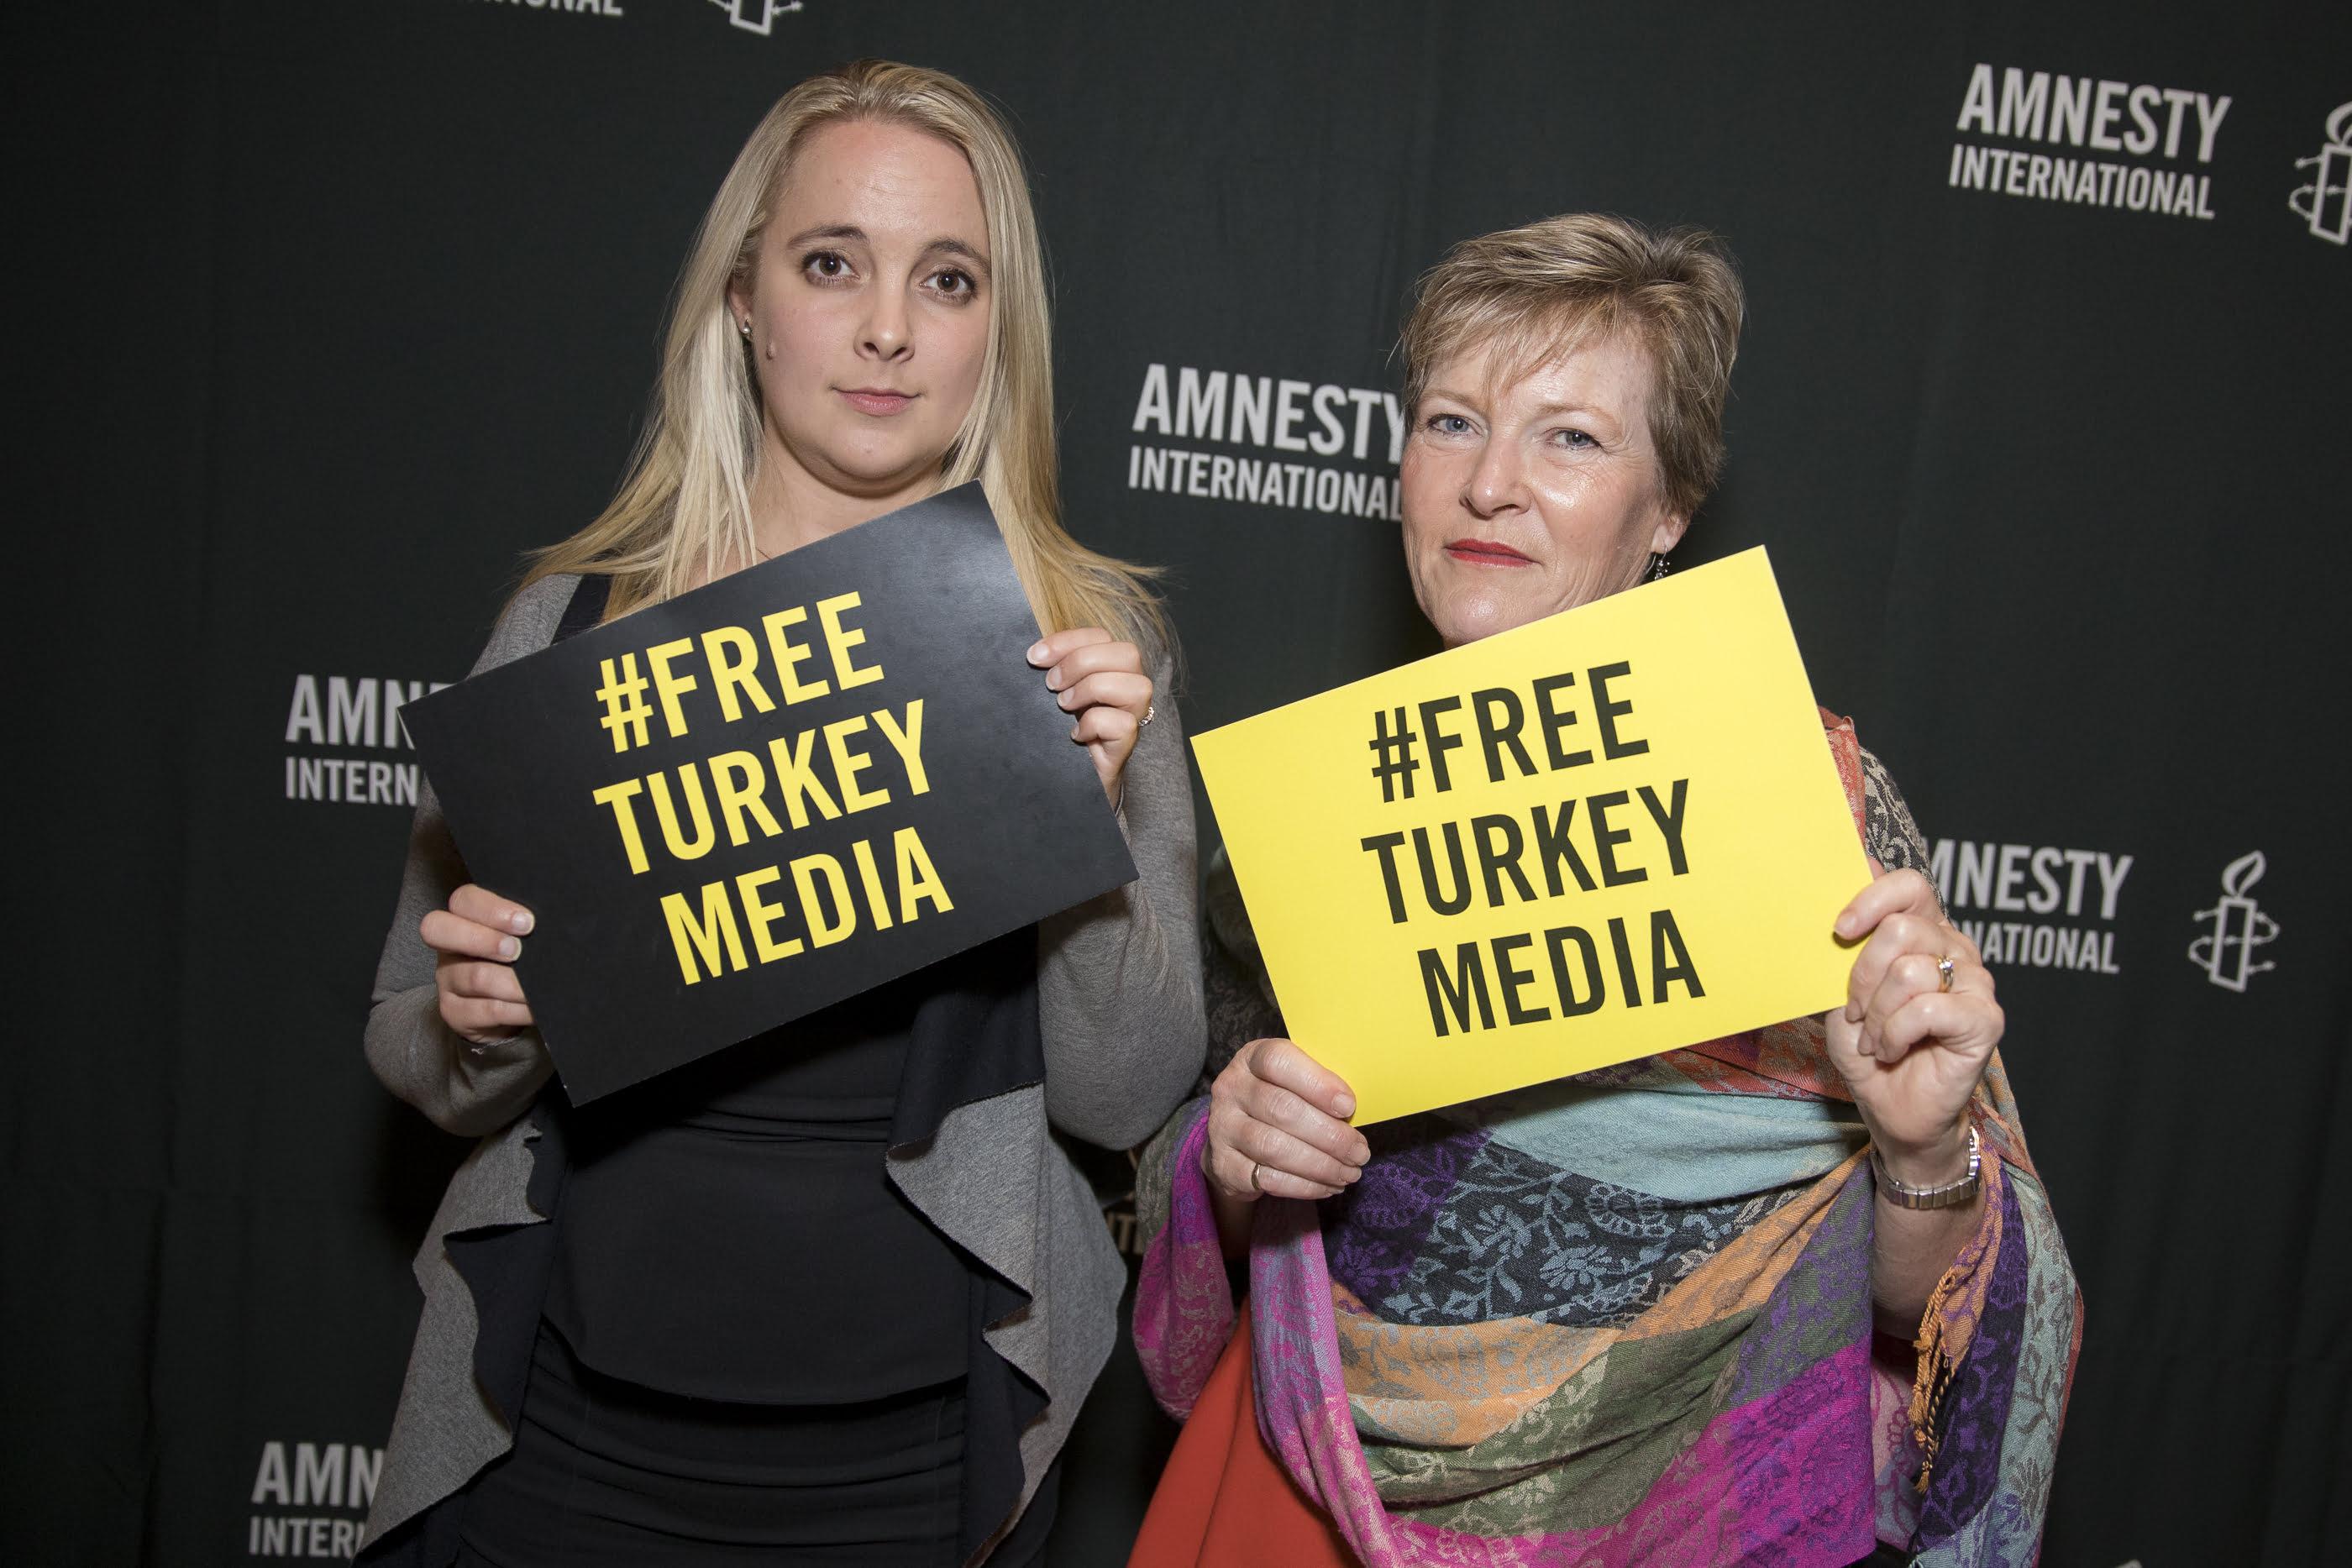 2017 Amnesty International Media Awards. © Joseph Mayers Photography